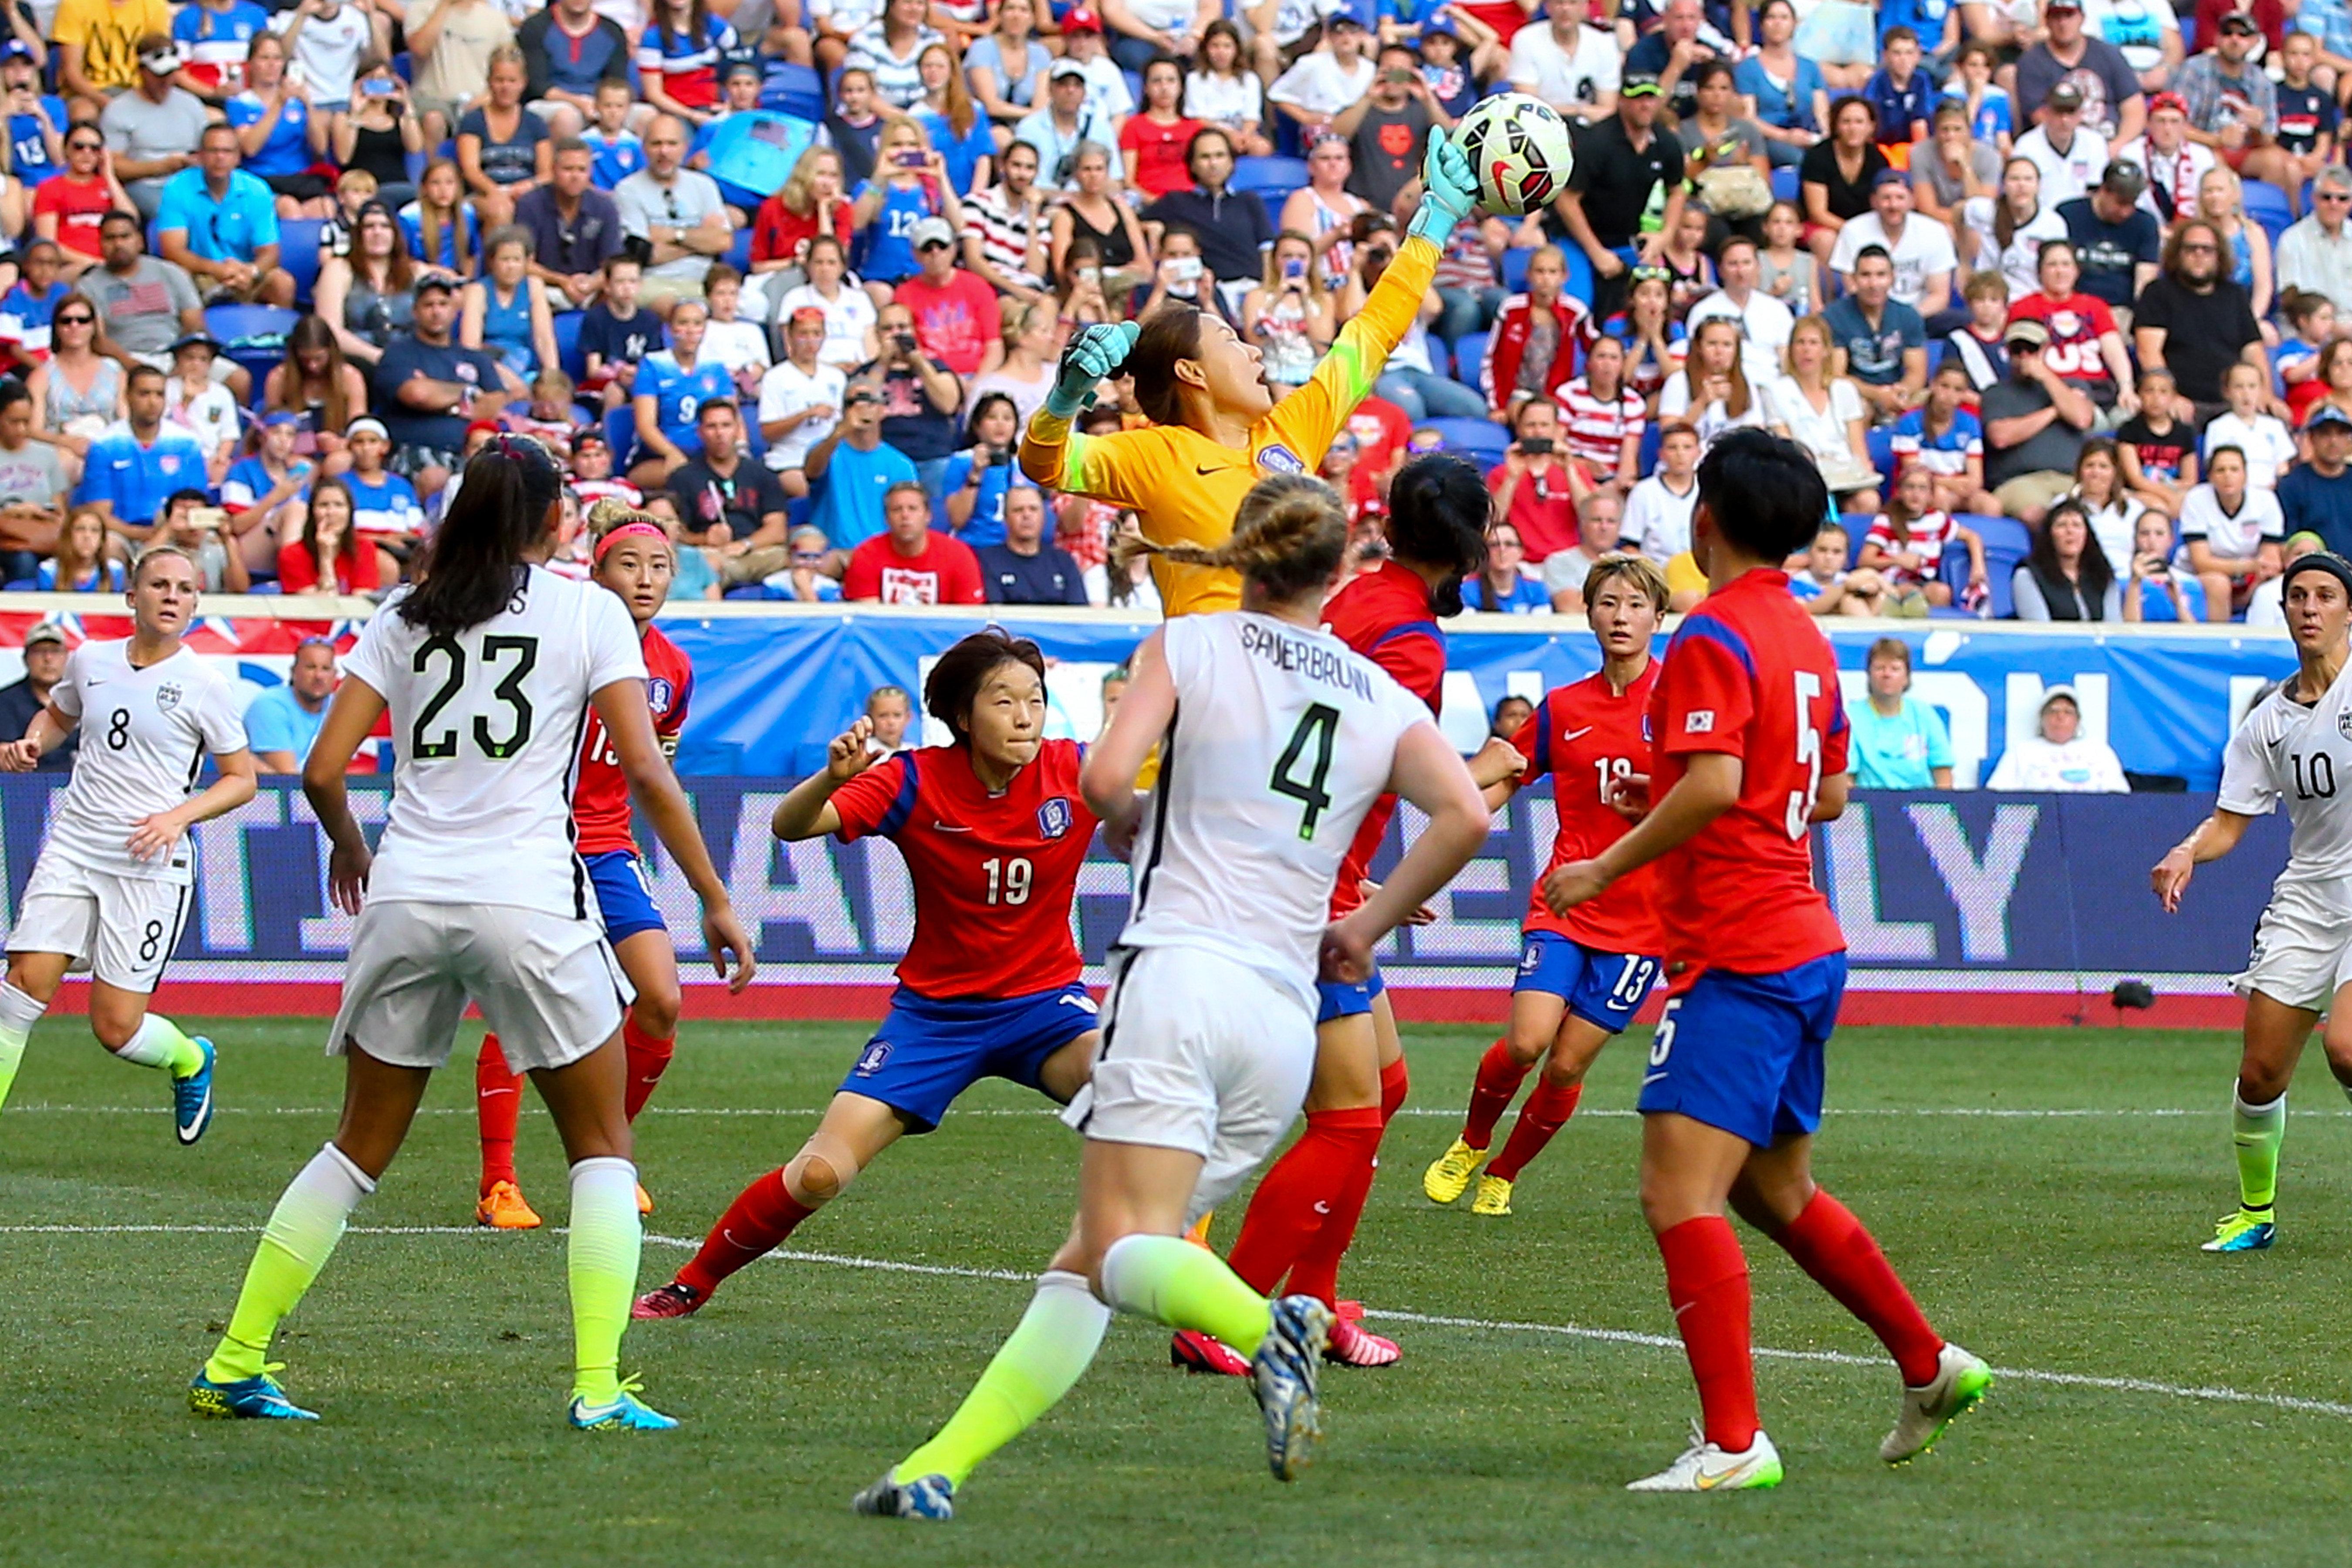 SOCCER: MAY 30 Women's - USA v Korea Republic